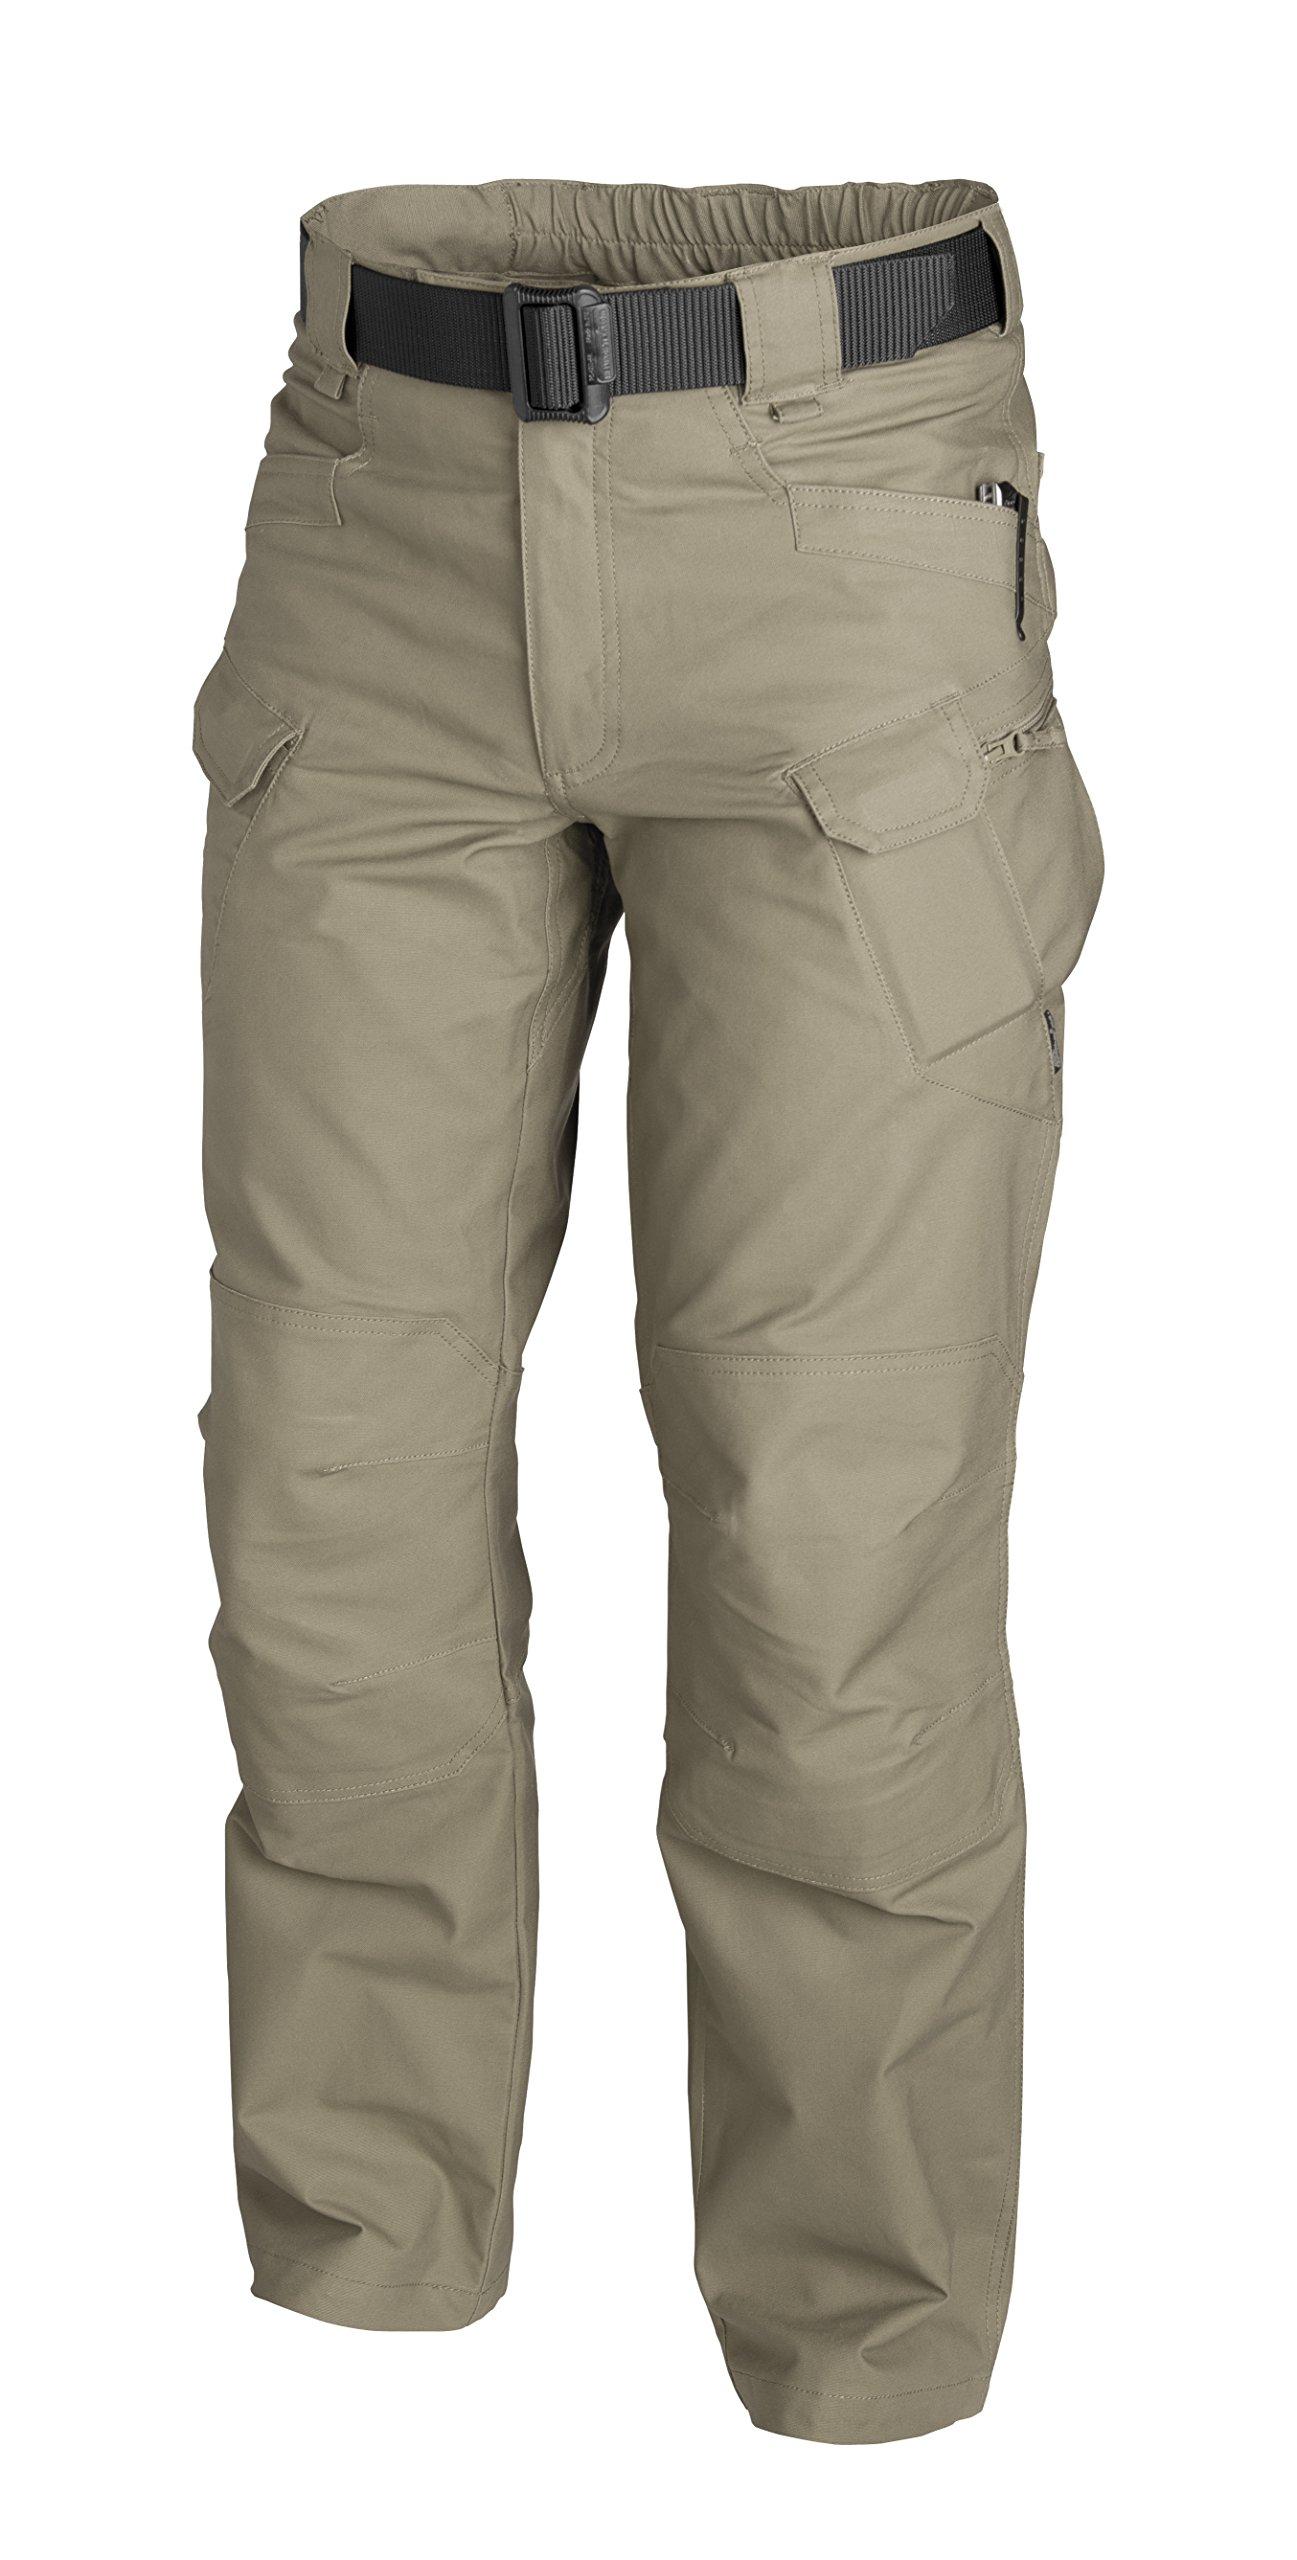 HELIKON-TEX Urban Line, UTP Urban Tactical Pants Ripstop Khaki, Military Ripstop Cargo Style, Men's Waist 38 Length 32 by HELIKON-TEX (Image #3)